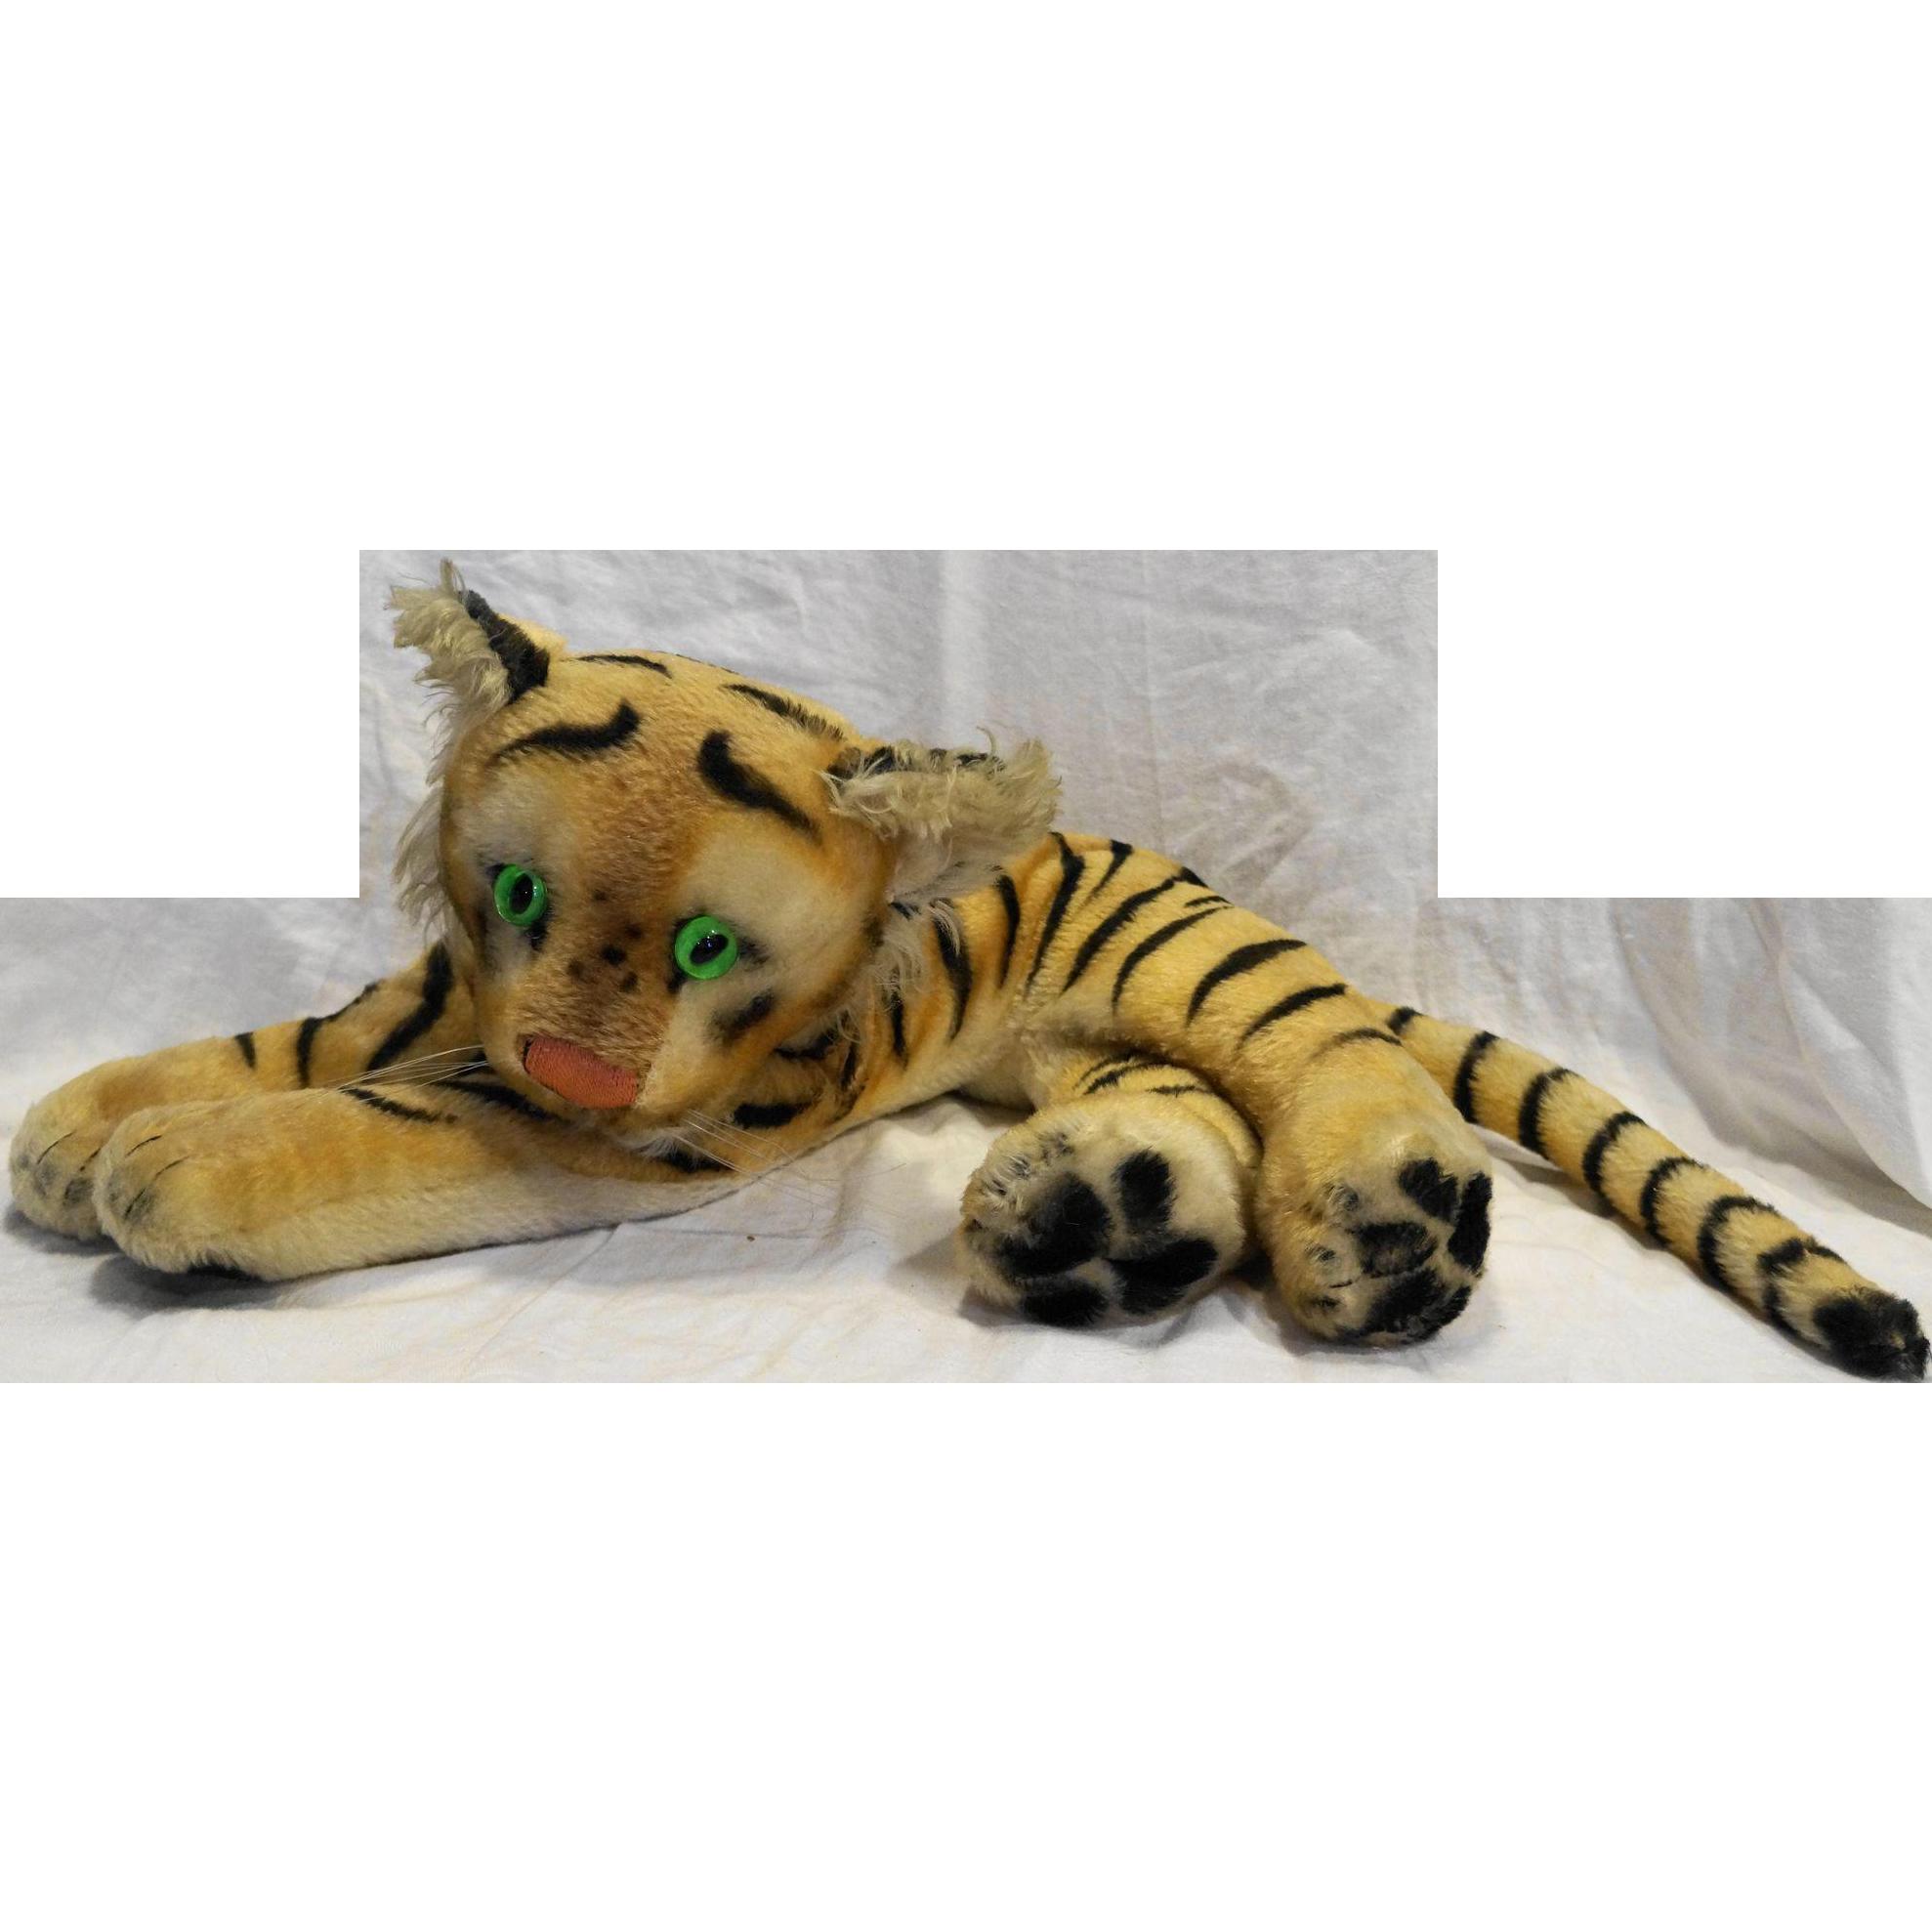 Steiff Tiger Cub Lying Vintage Green Glass Eyes 1950s-70s Large